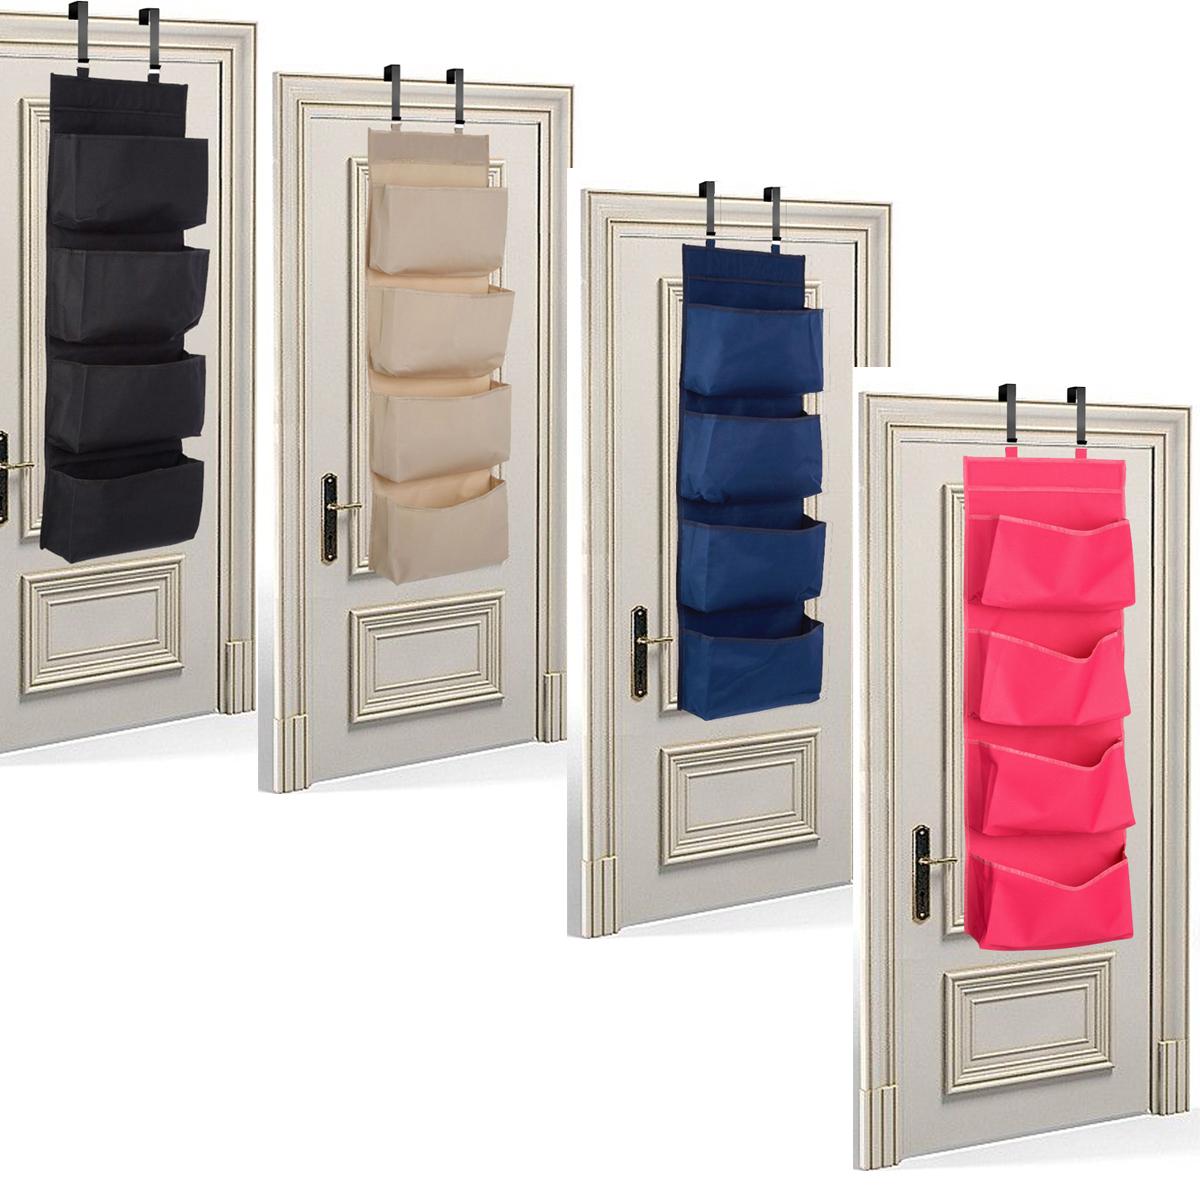 Livivo 4 Tier Over The Door Hanging Organiser Storage Pockets Shoes